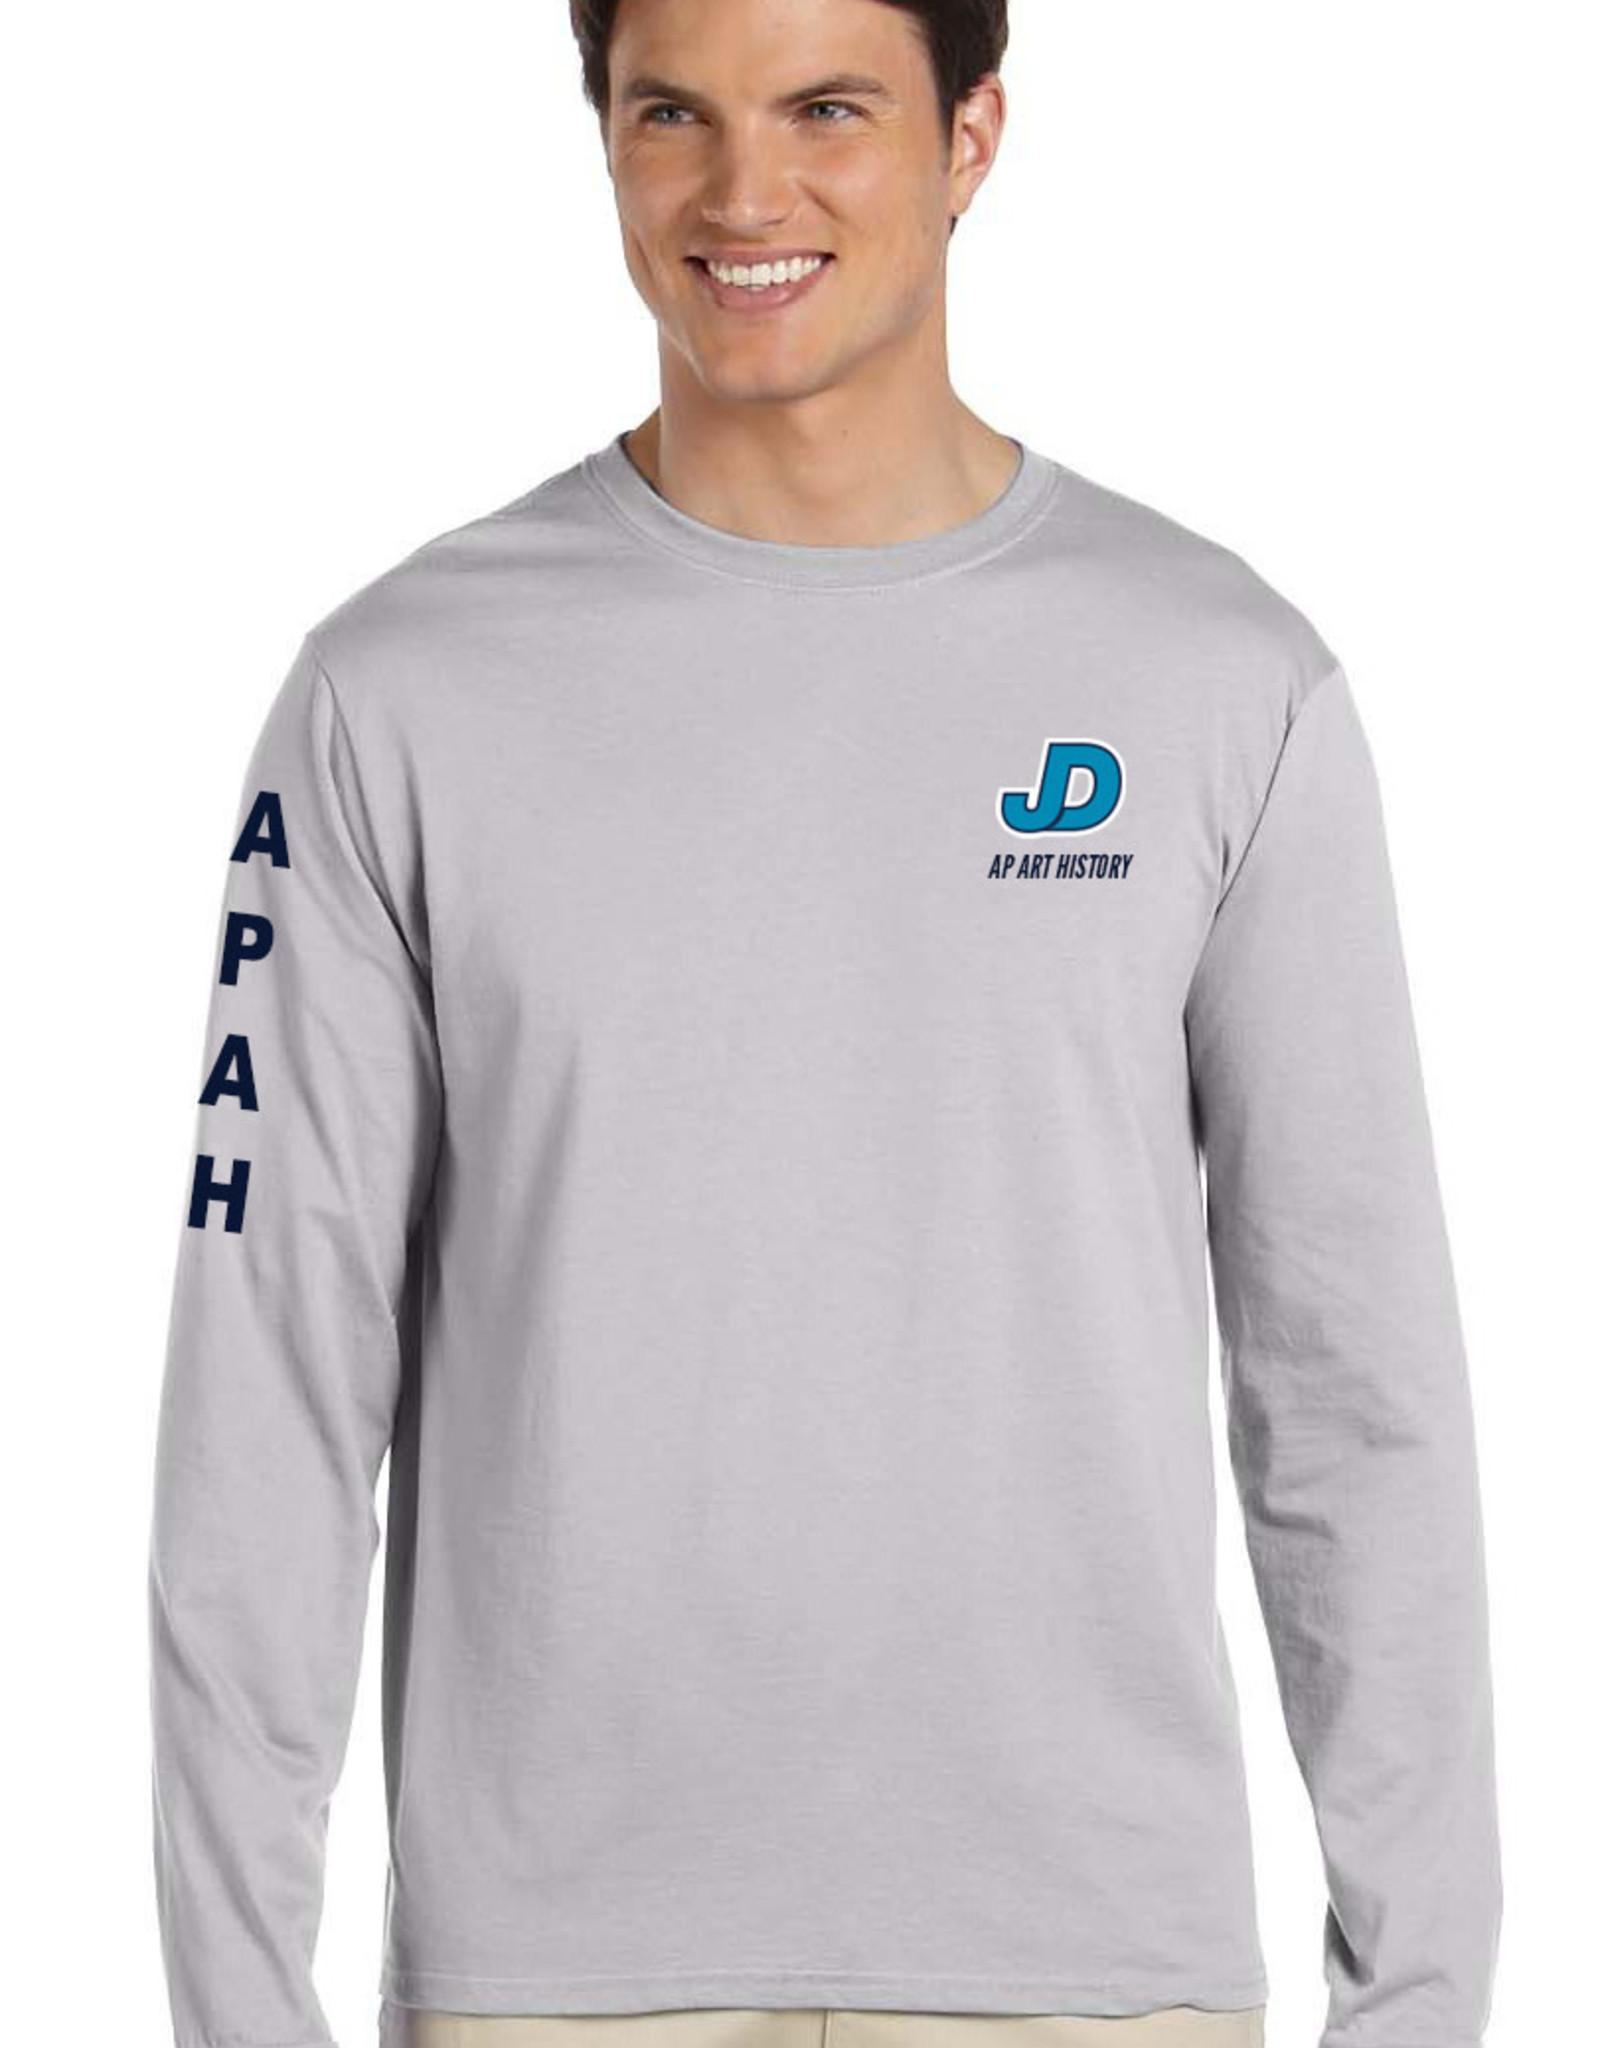 NON-UNIFORM JD AP Art History Unisex Long Sleeve Shirt, Gray